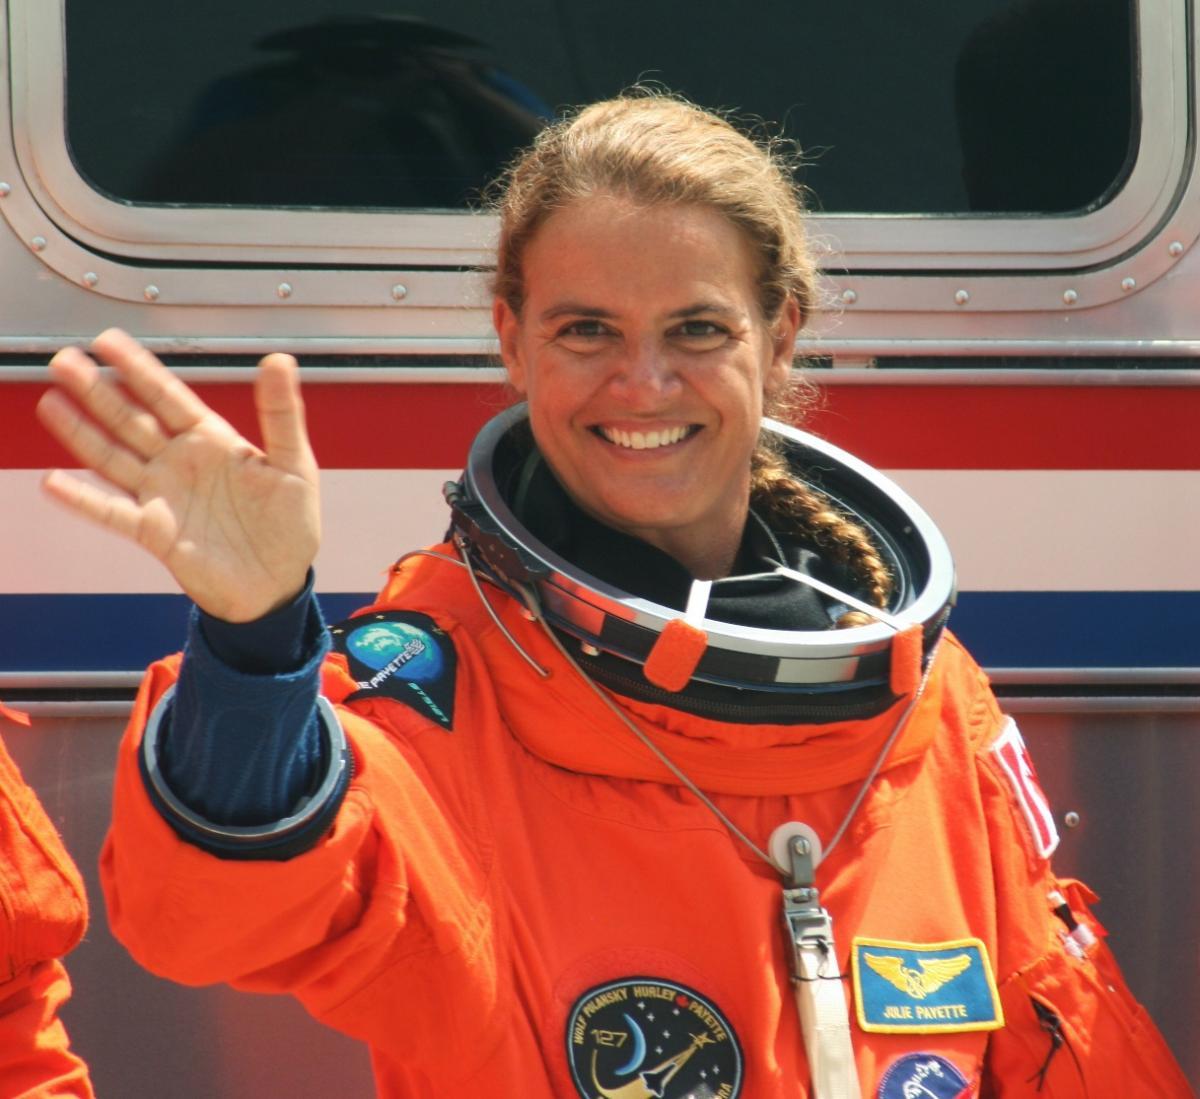 canadian-astronaut-julie-payette-2.jpg